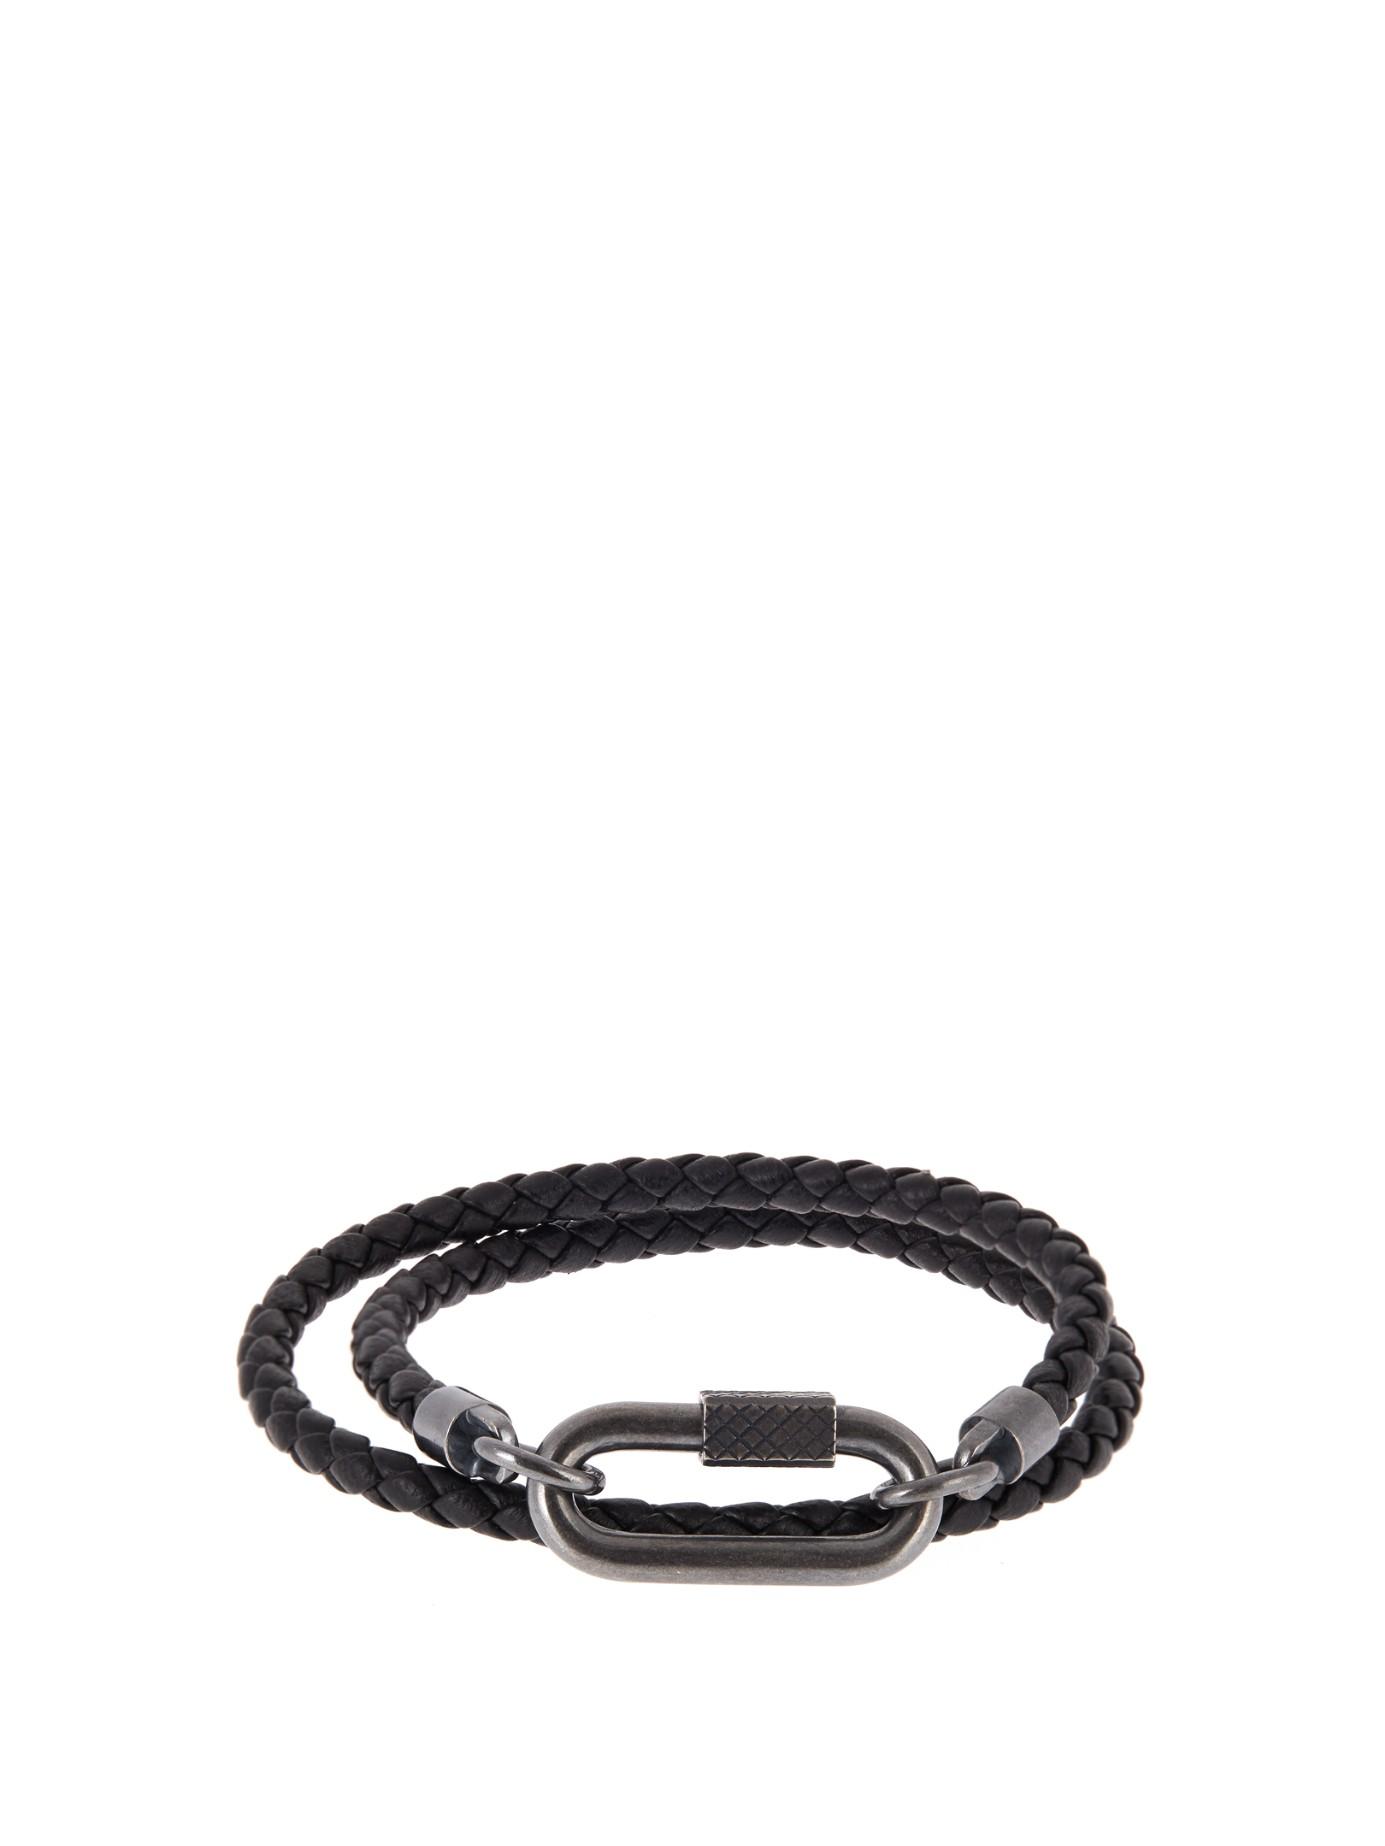 14704d3091835 Bottega Veneta Intrecciato Leather Double-row Wrap Bracelets ...